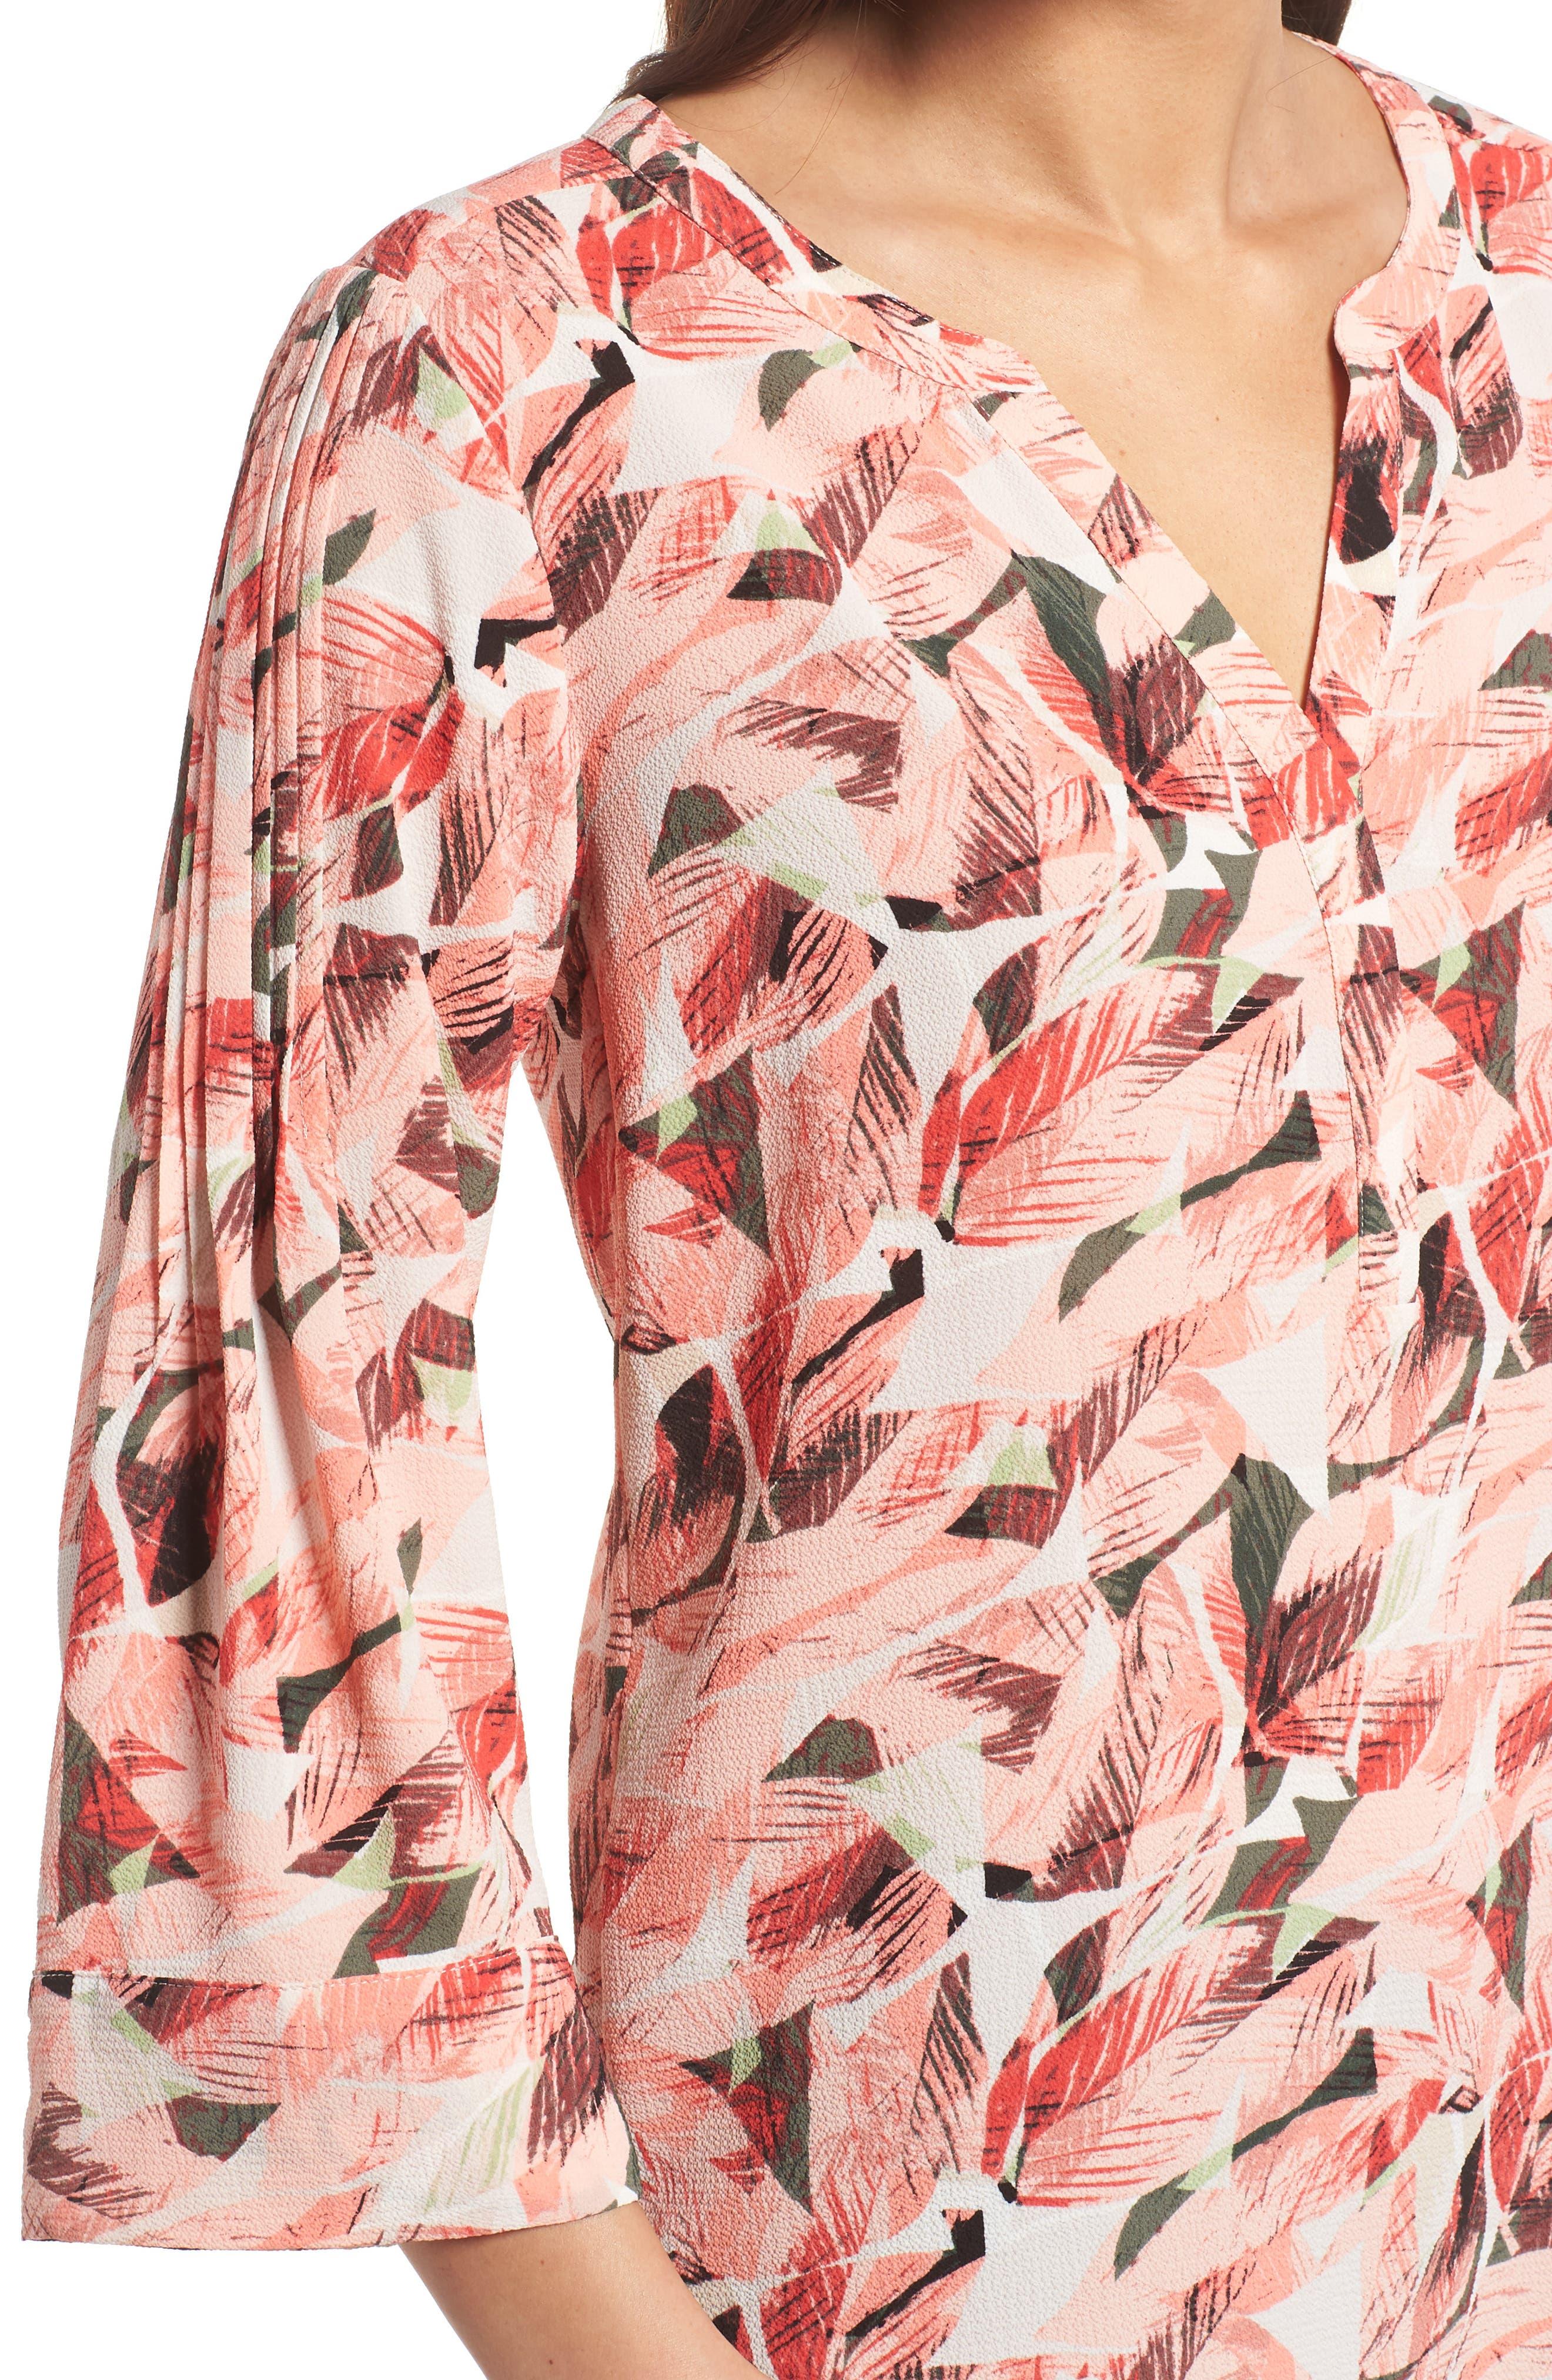 Tropical Print Pleated Sleeve Top,                             Alternate thumbnail 4, color,                             867-Sunrisepeach